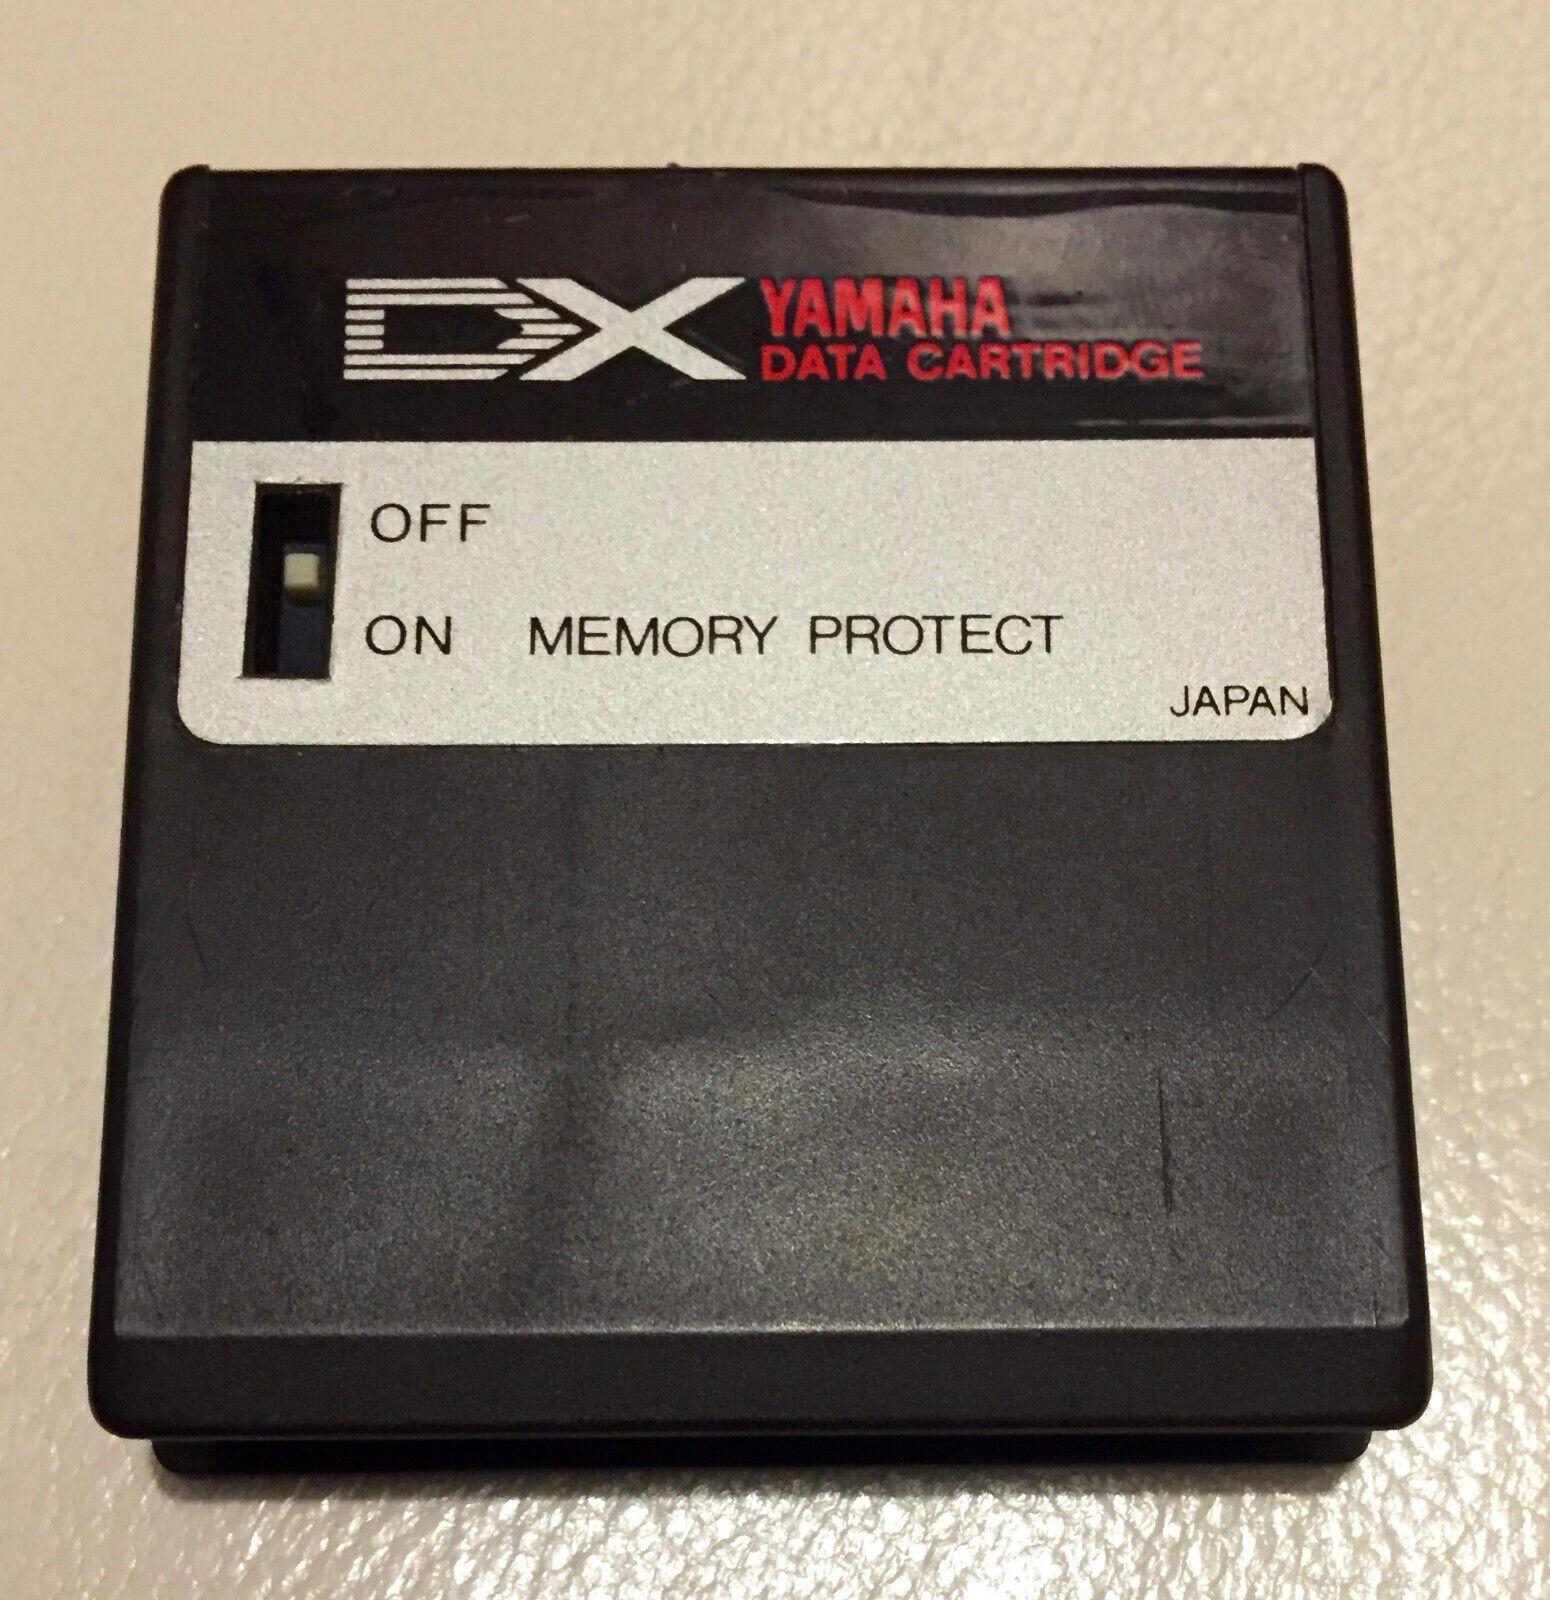 Yamaha DX7 DX RAM DATA Cartridge For DX-7 Mk1 SyntheGrößer